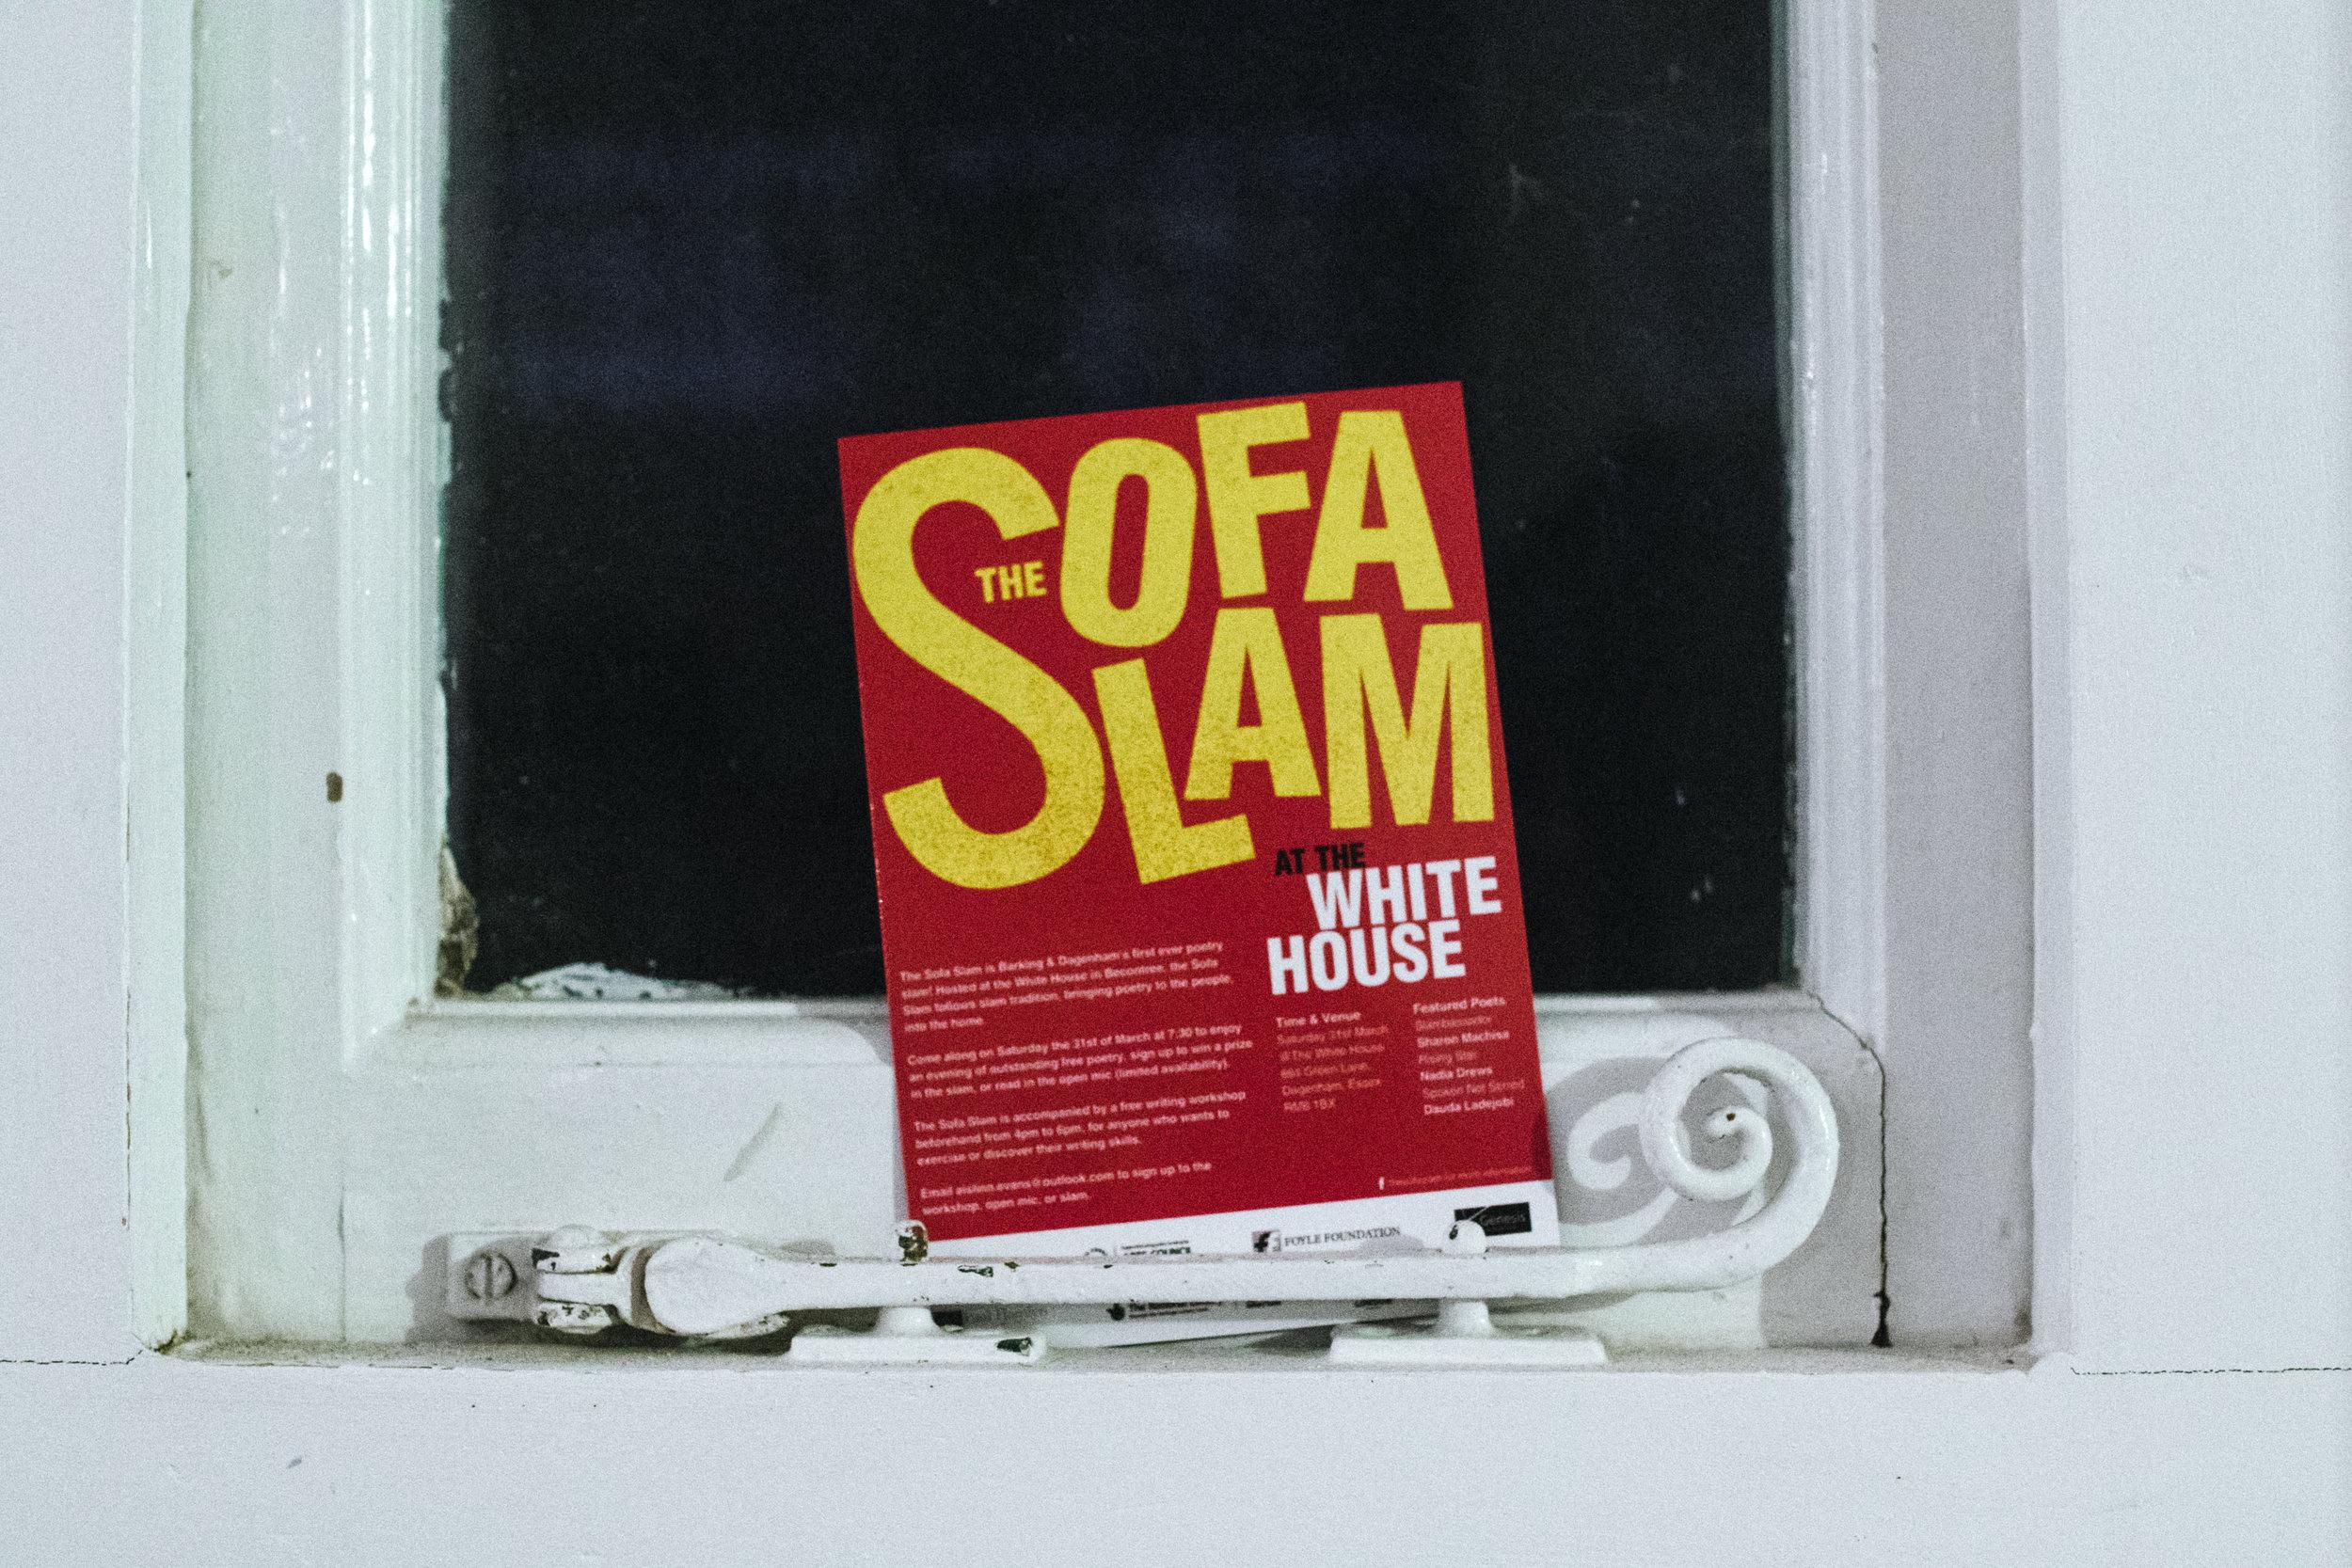 The Sofa Slam at the White House